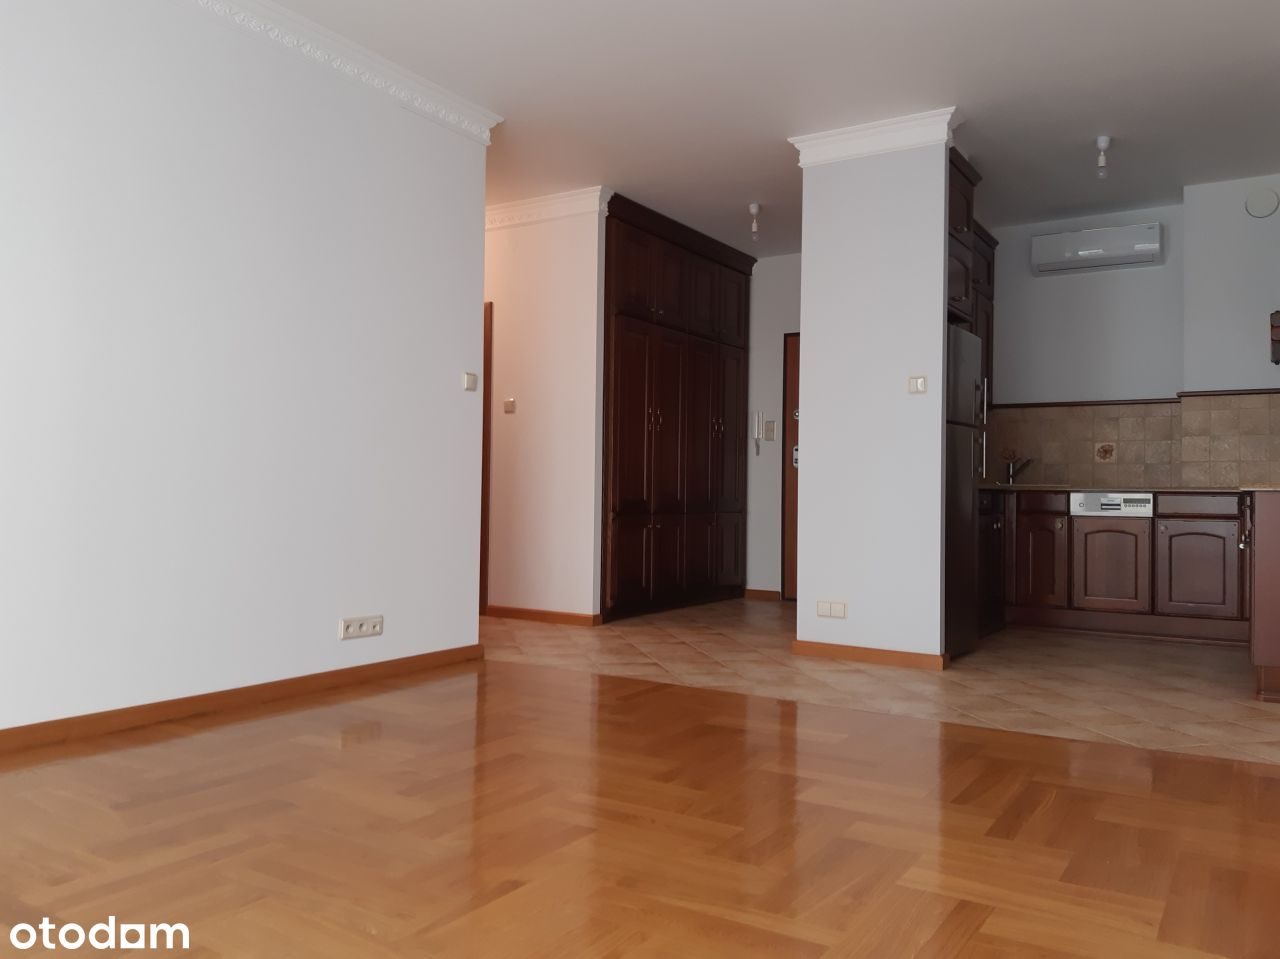 Bezpośrednio 3 pokoje, garaż, komórka_Ewen Shiraz